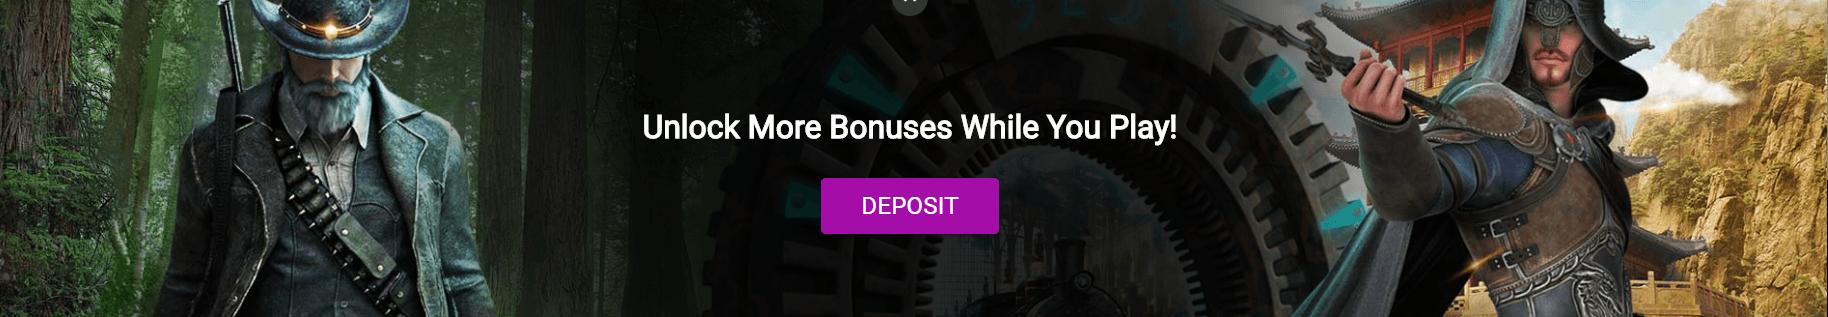 jackpotcity bonuses and promotions - OCCanada